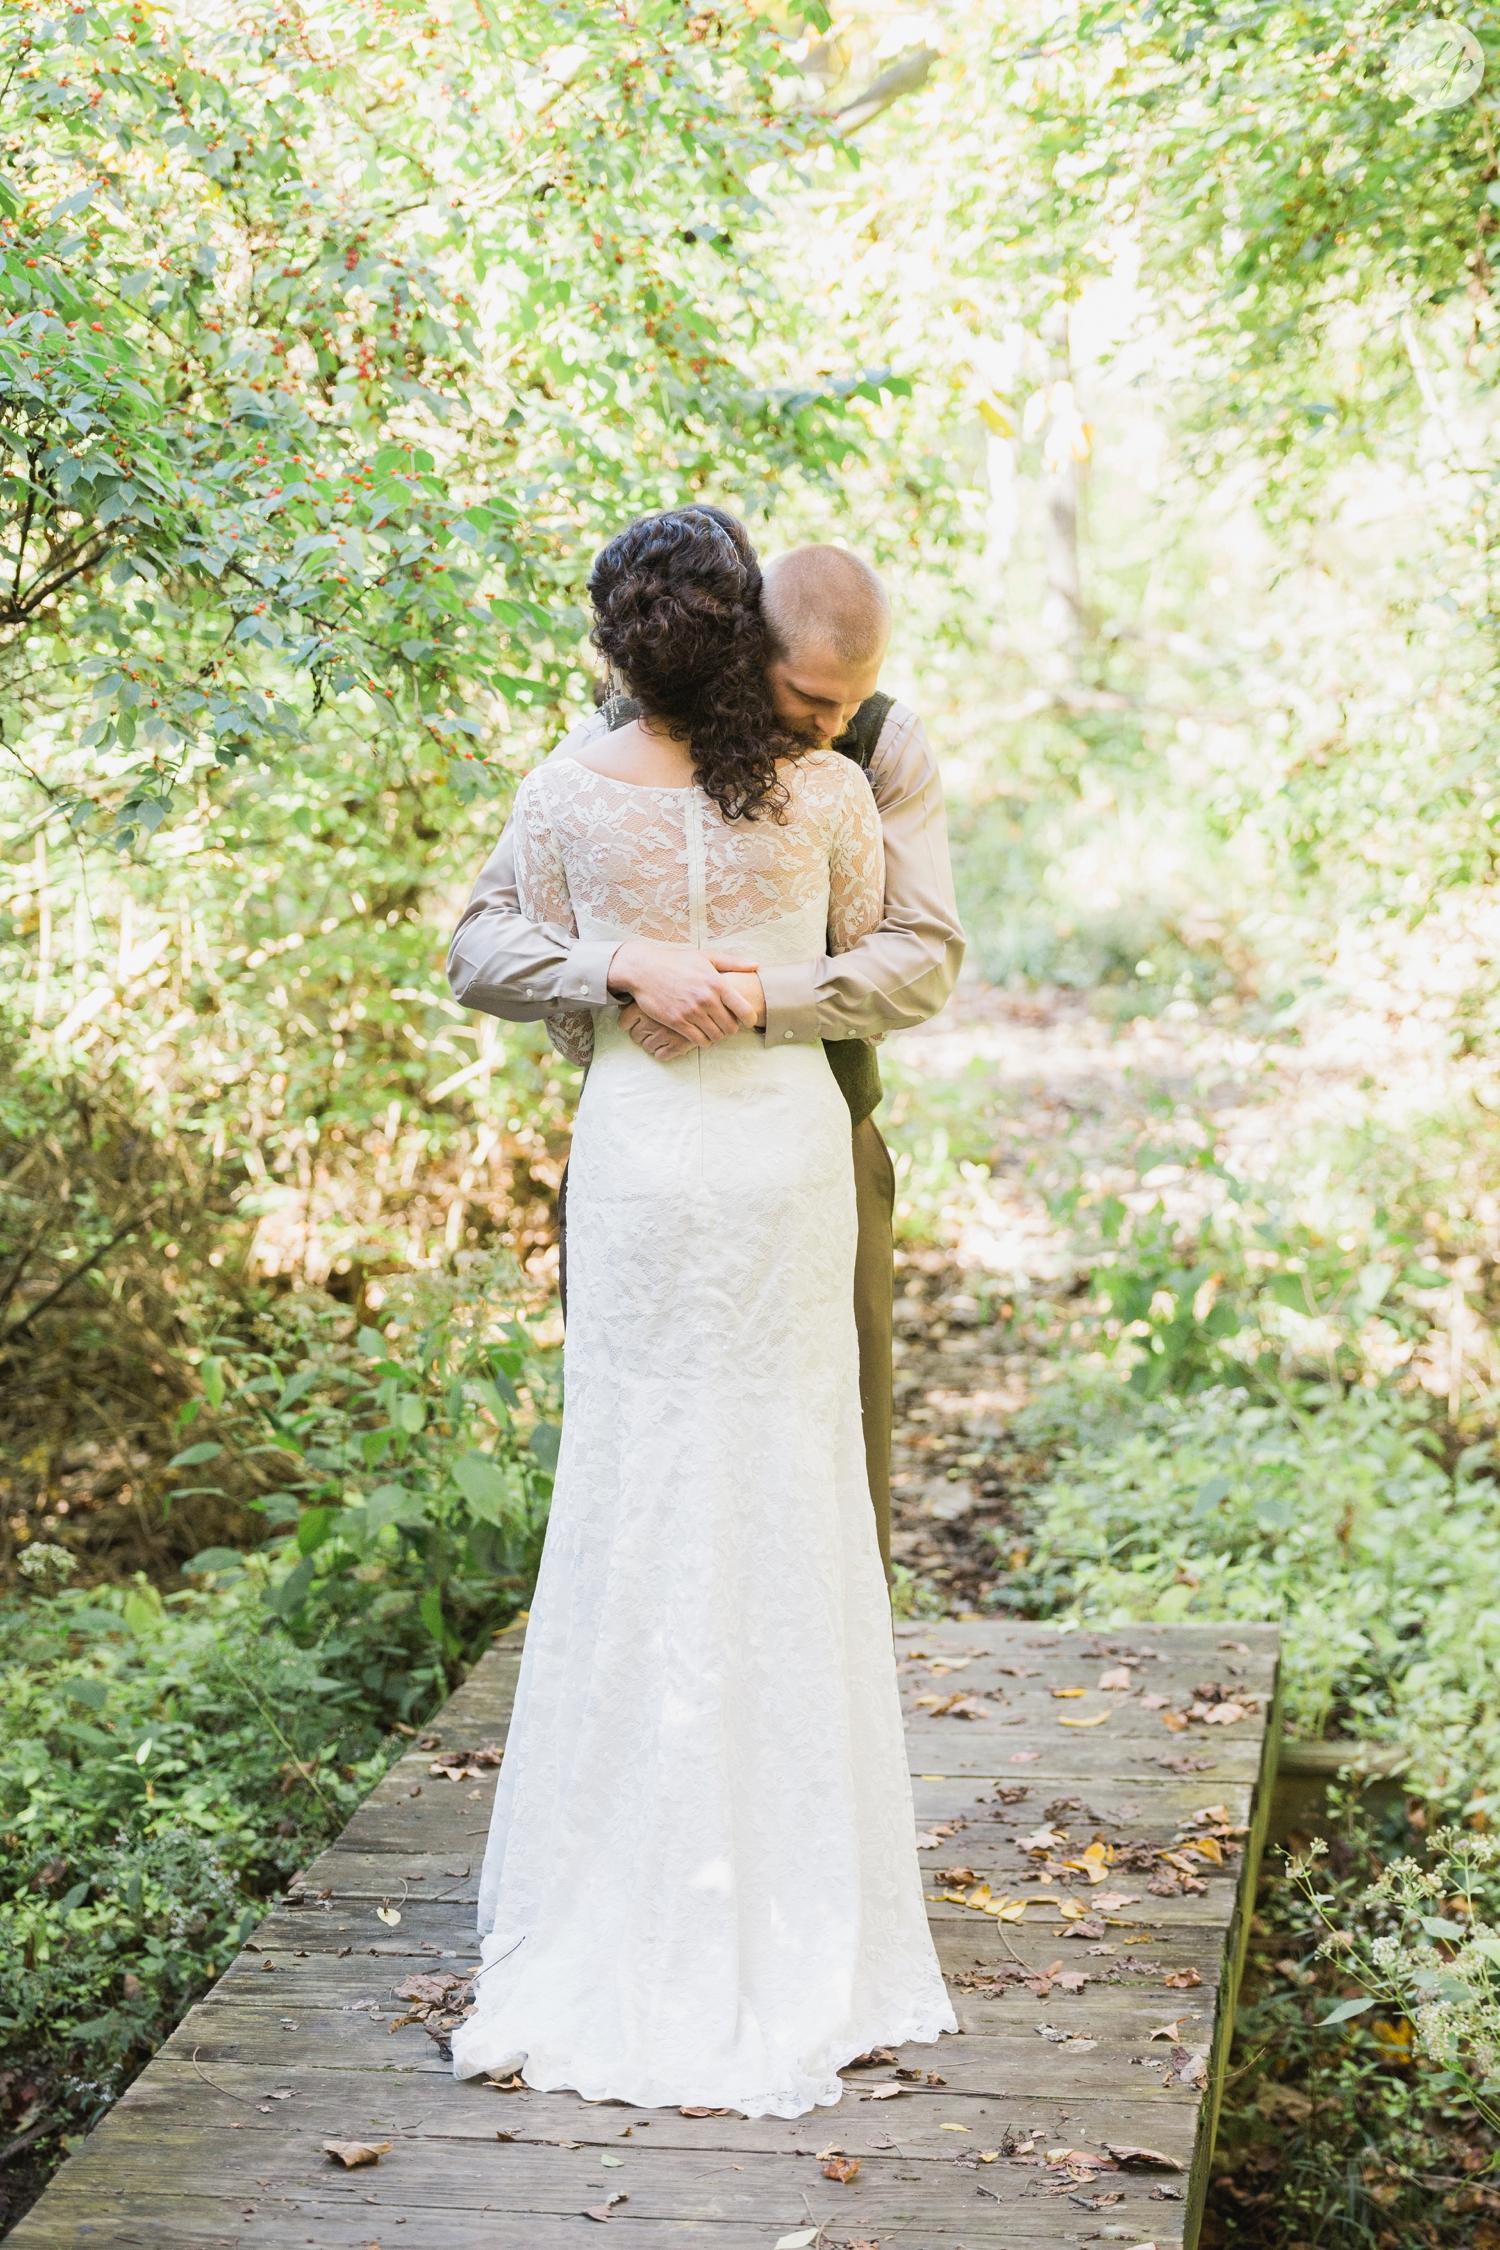 Outdoor-Wedding-in-the-Woods-Photography_4204.jpg